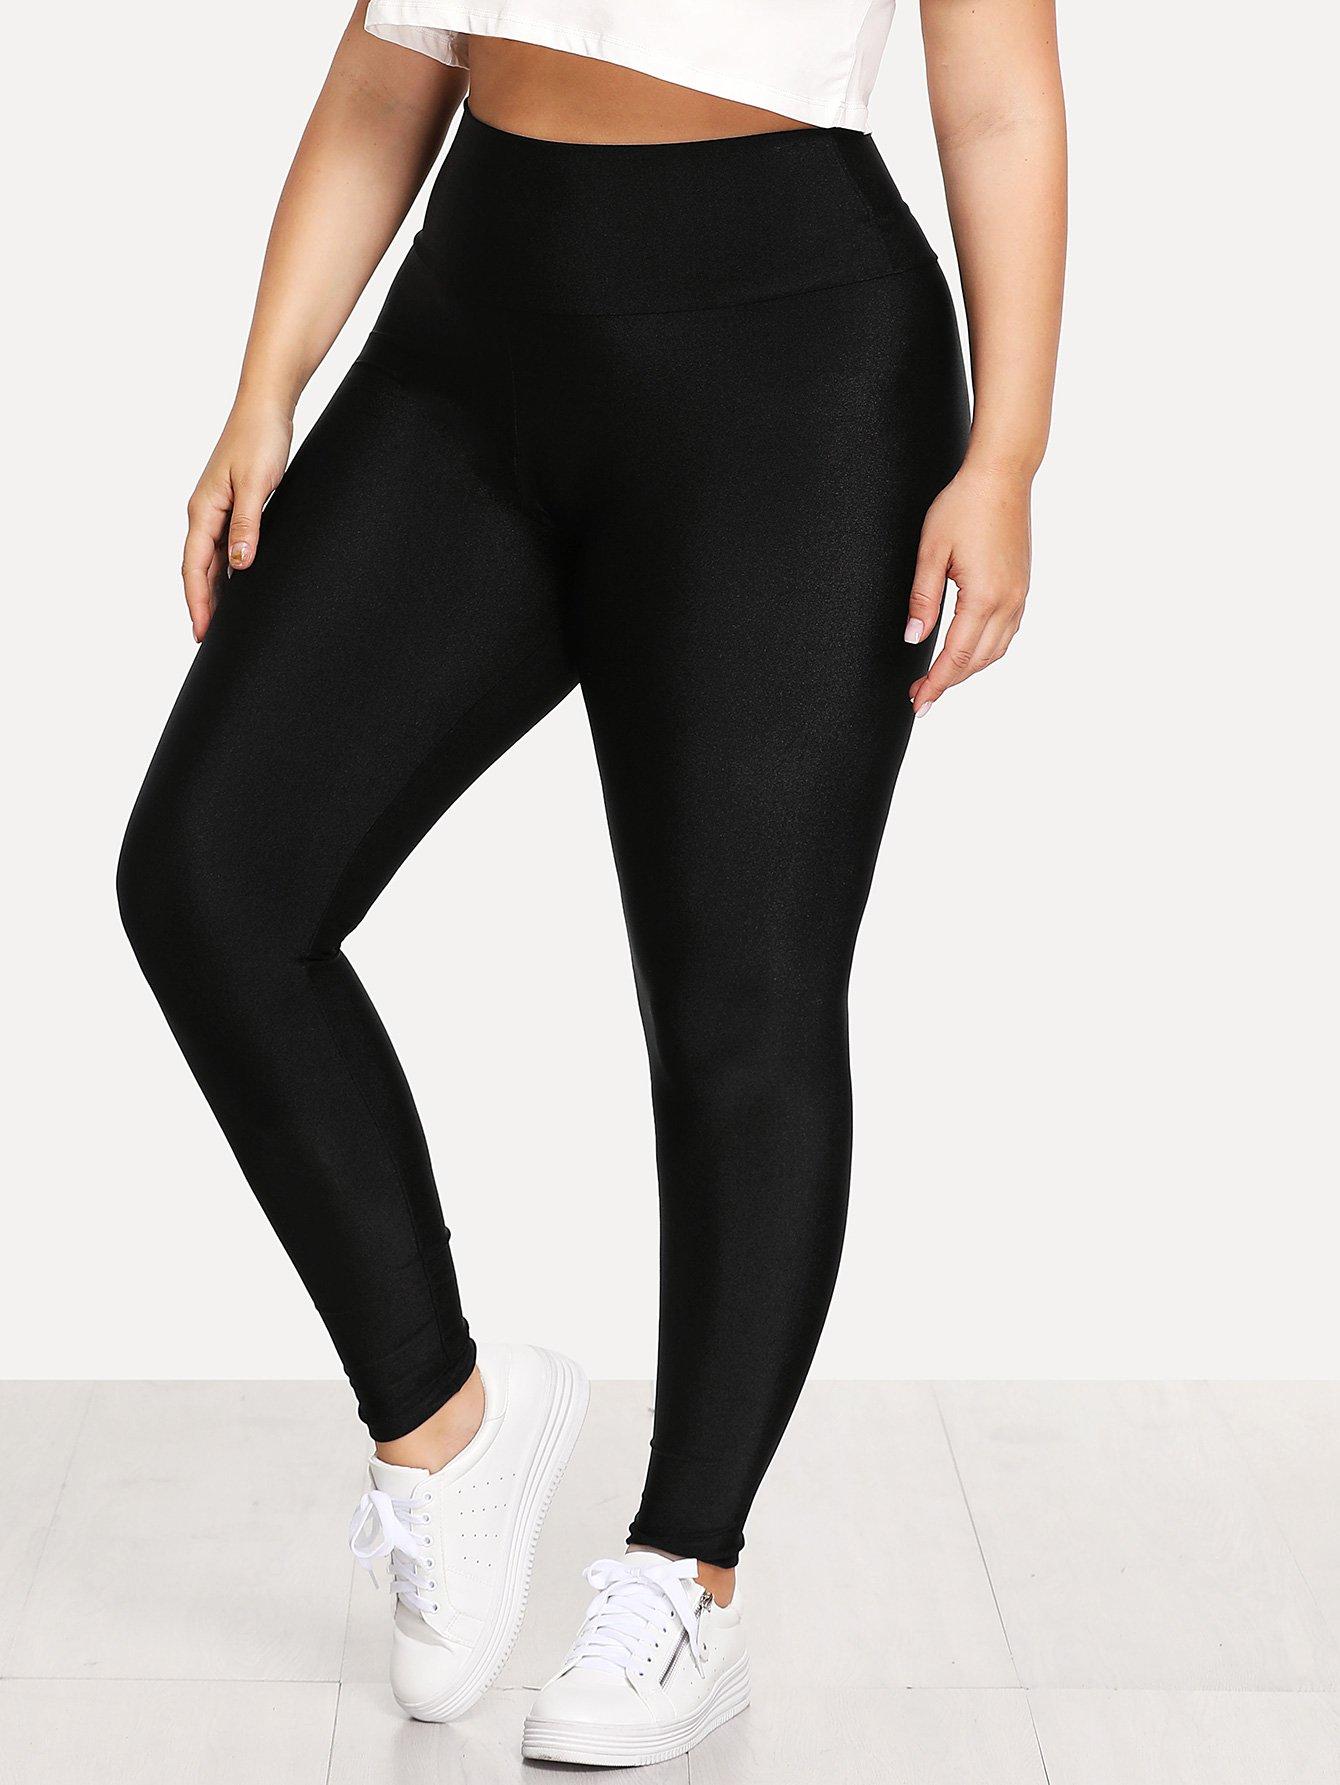 Plus Elastic Waist Skinny Leggings elastic waist skinny leggings